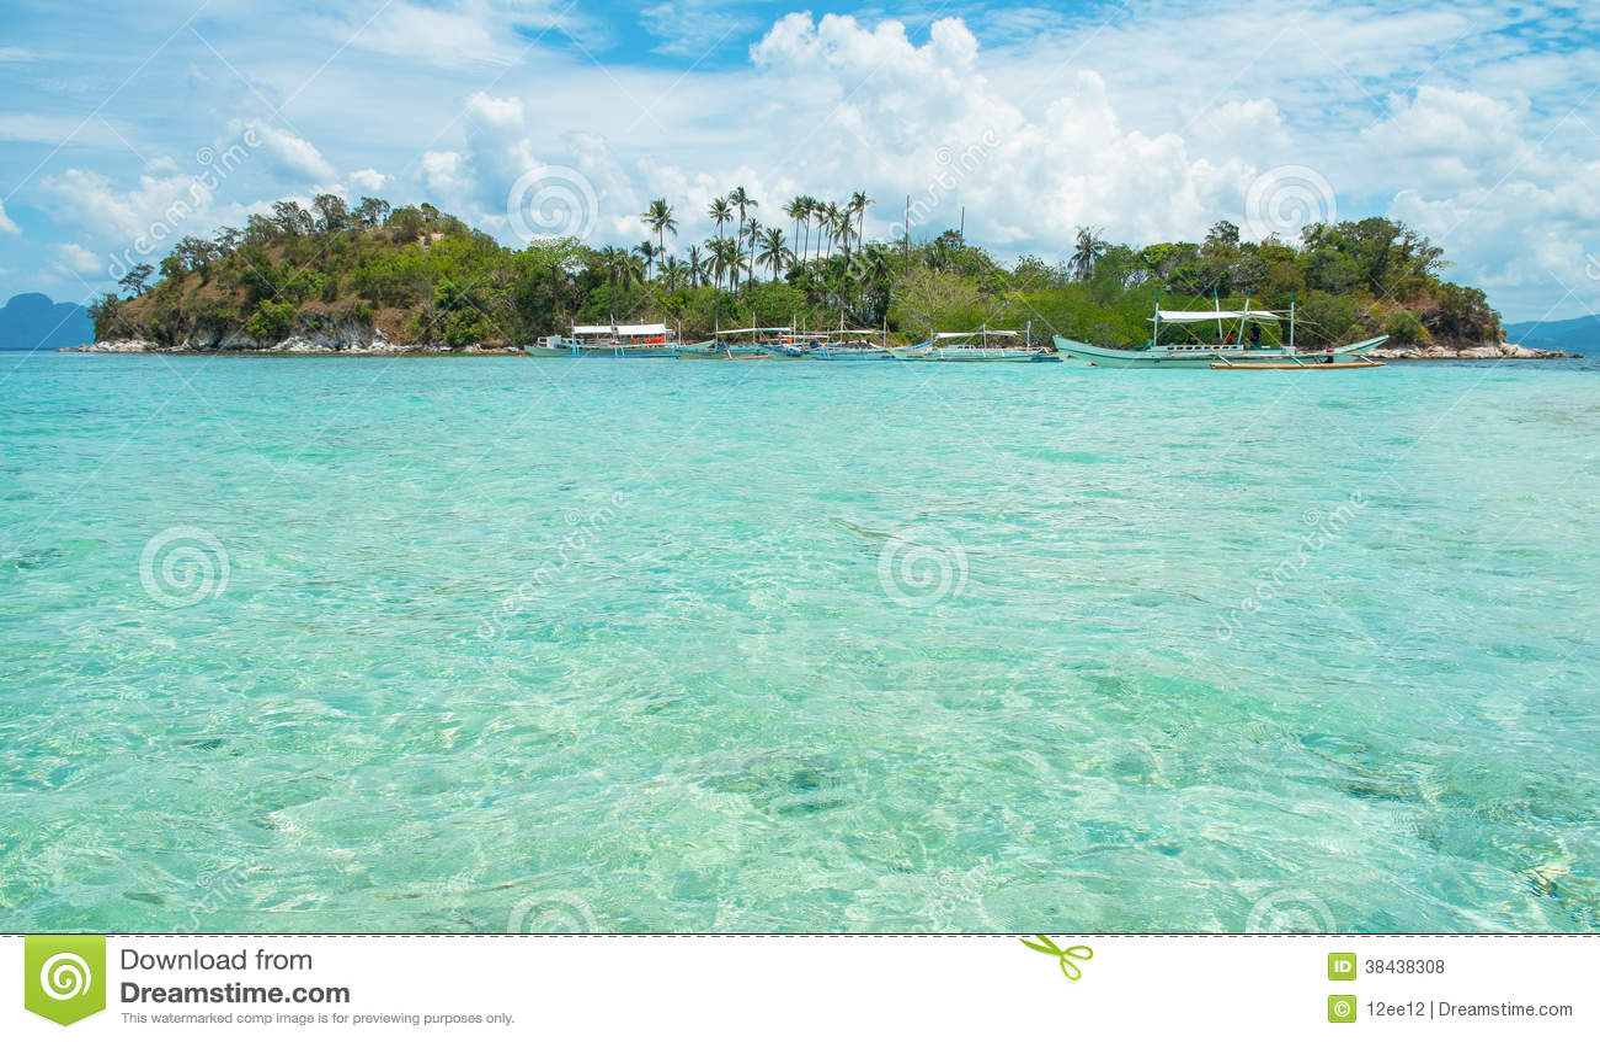 Lagoon Tropical Island: Tropical Island And Blue Lagoon Royalty Free Stock Photos